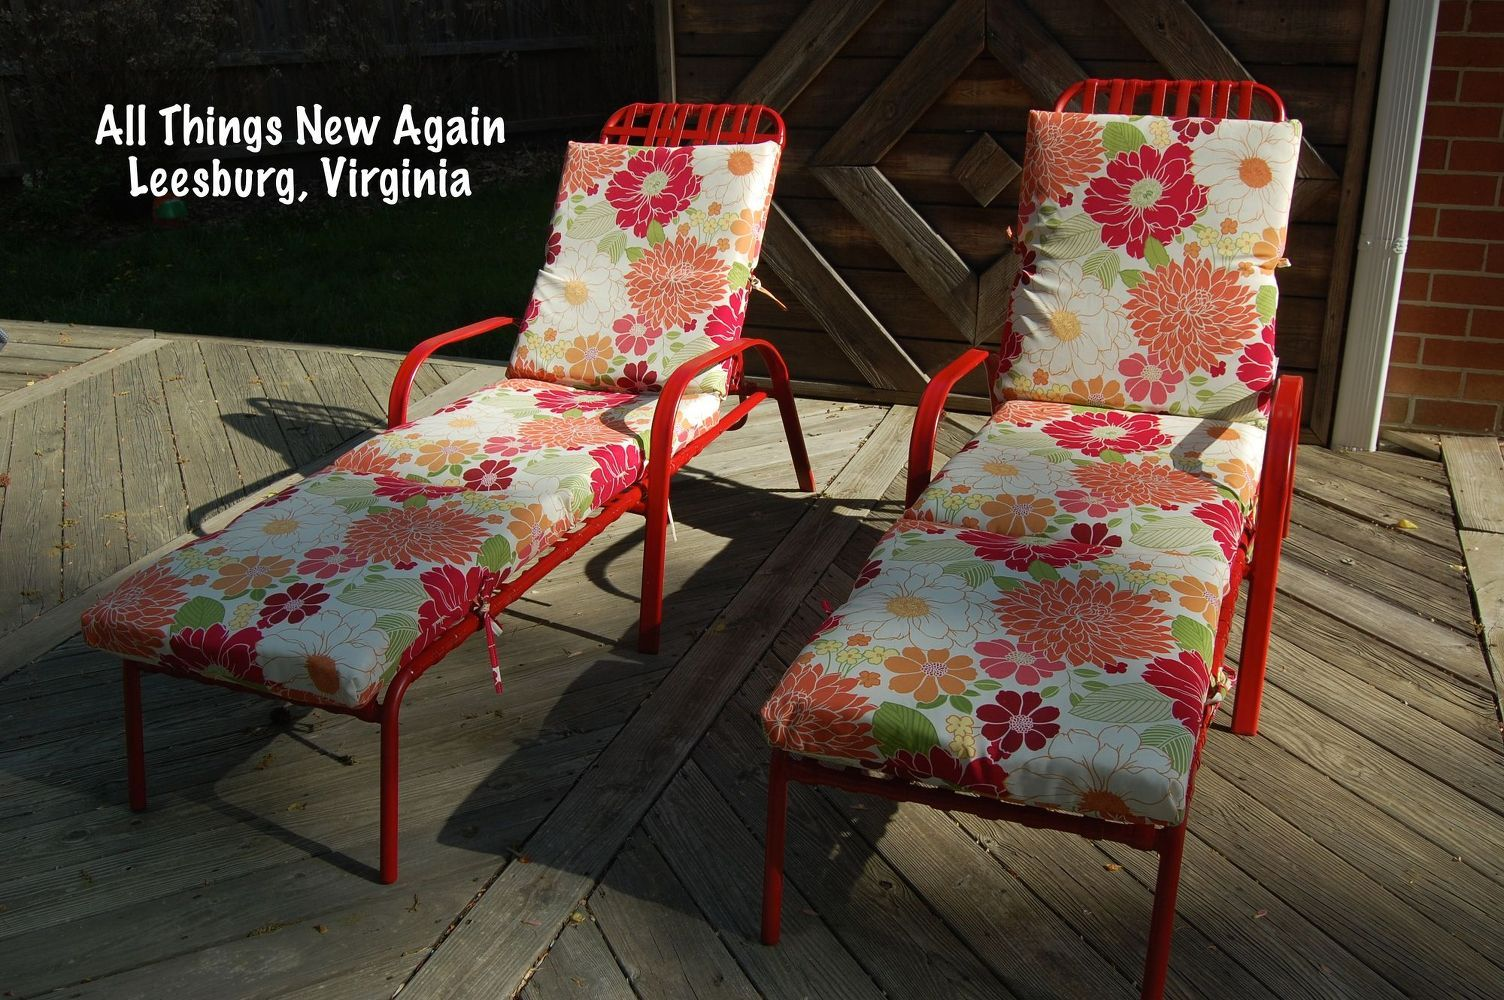 five star backyard seating on a no-tell motel budget | mobili ... - Mobili Da Giardino Idee Dipinte